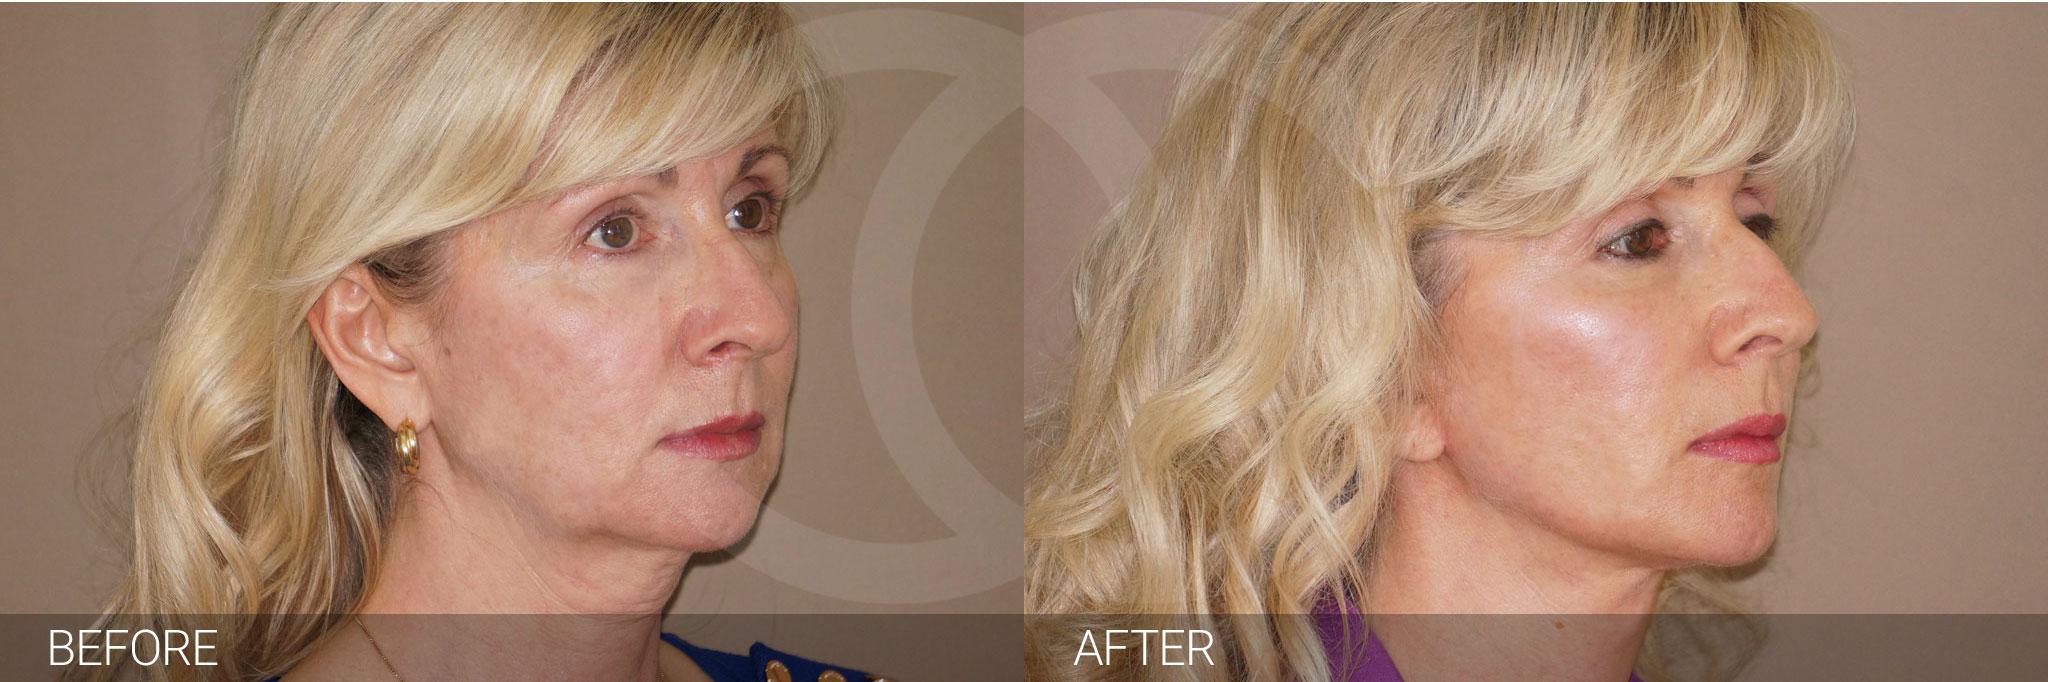 Fat grafting Facial fat transfer ante/post-op II